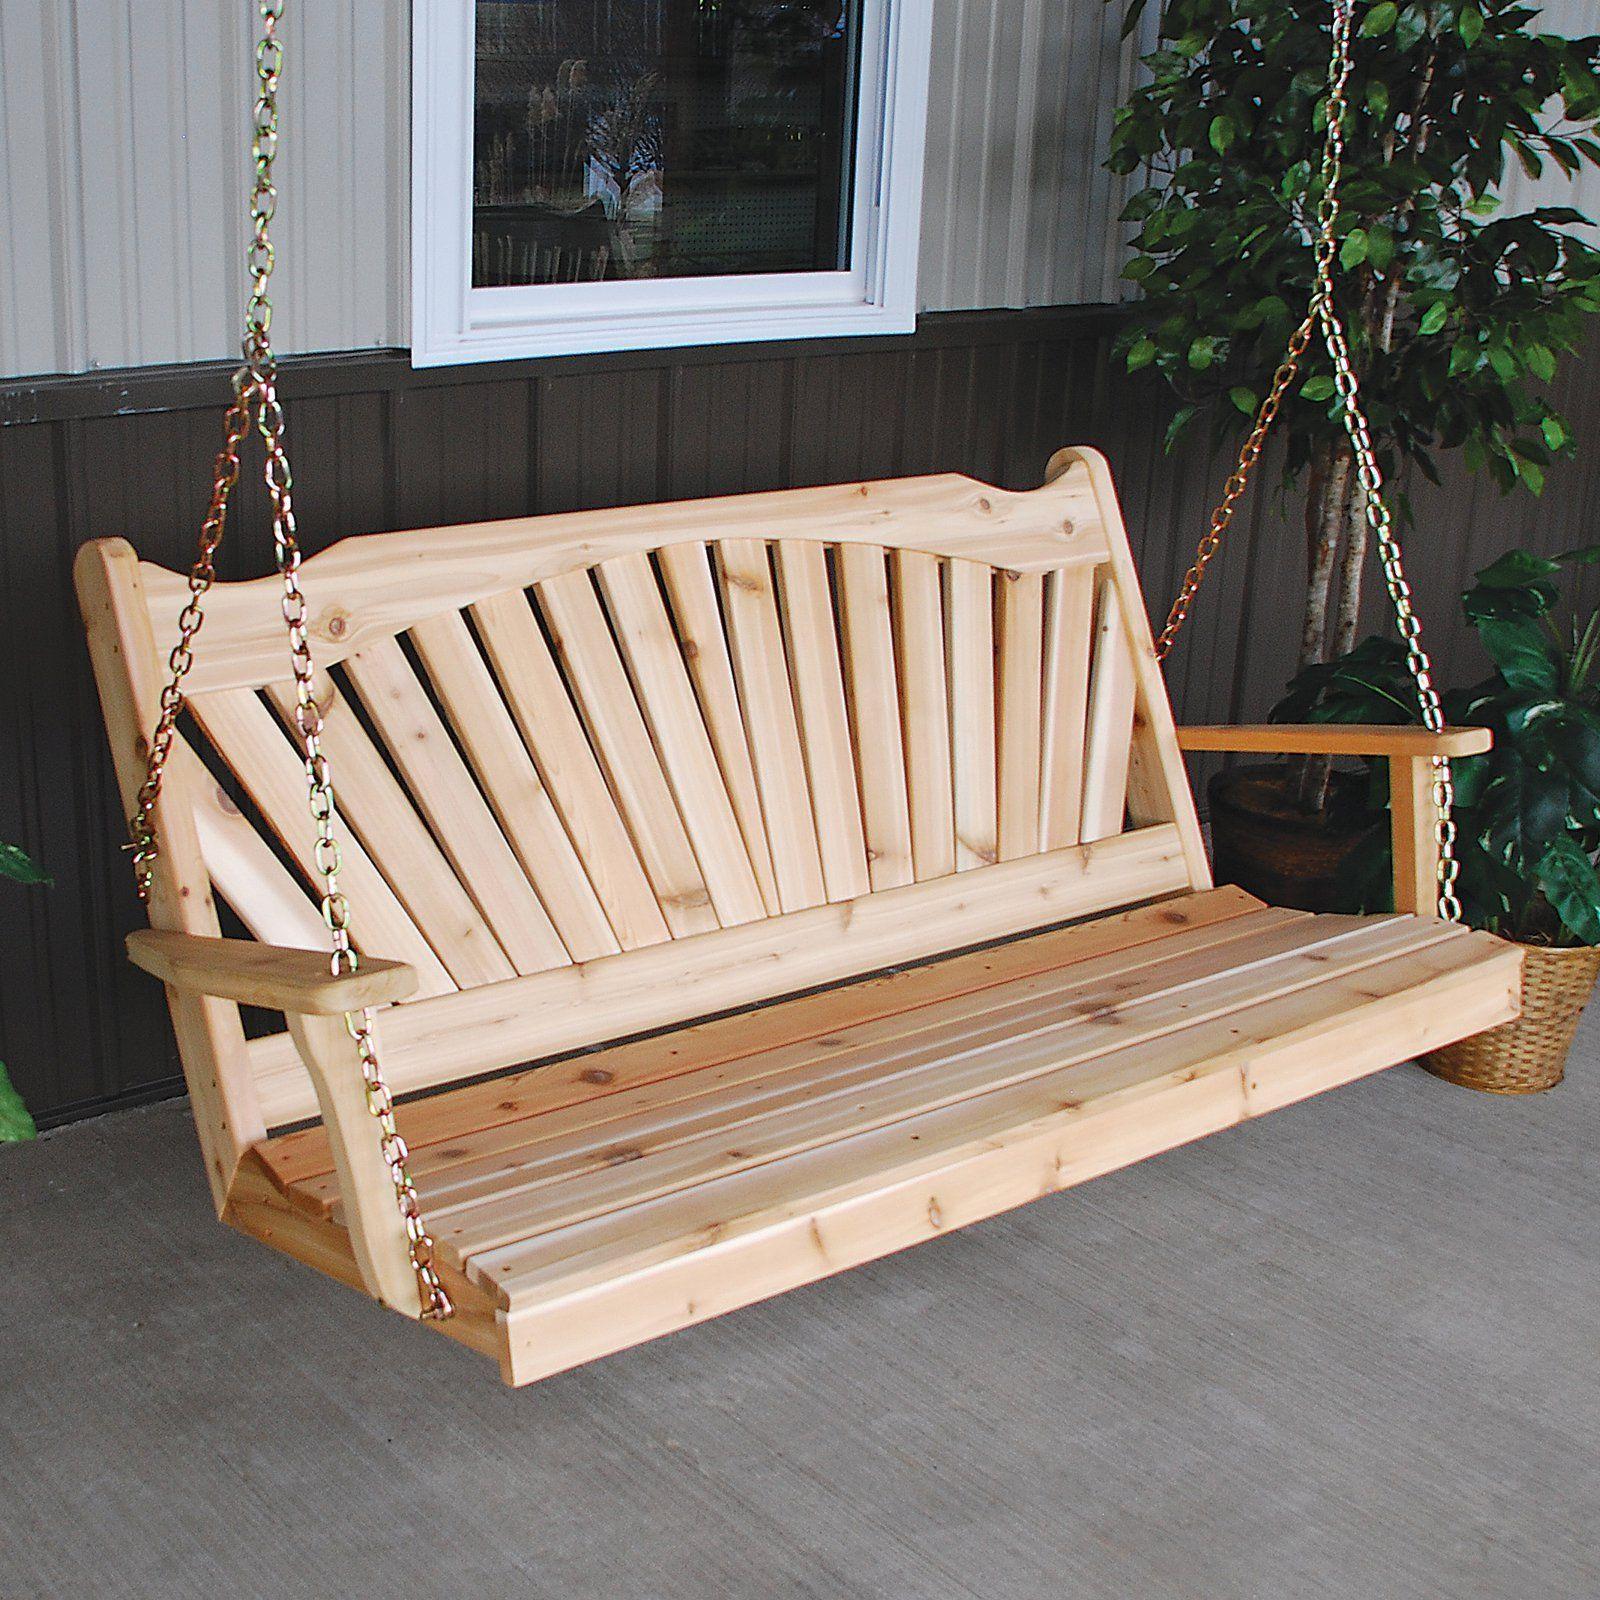 A L Furniture Fanback Western Red Cedar Porch Swing From Hayneedle Com Porch Swing Furniture Porch